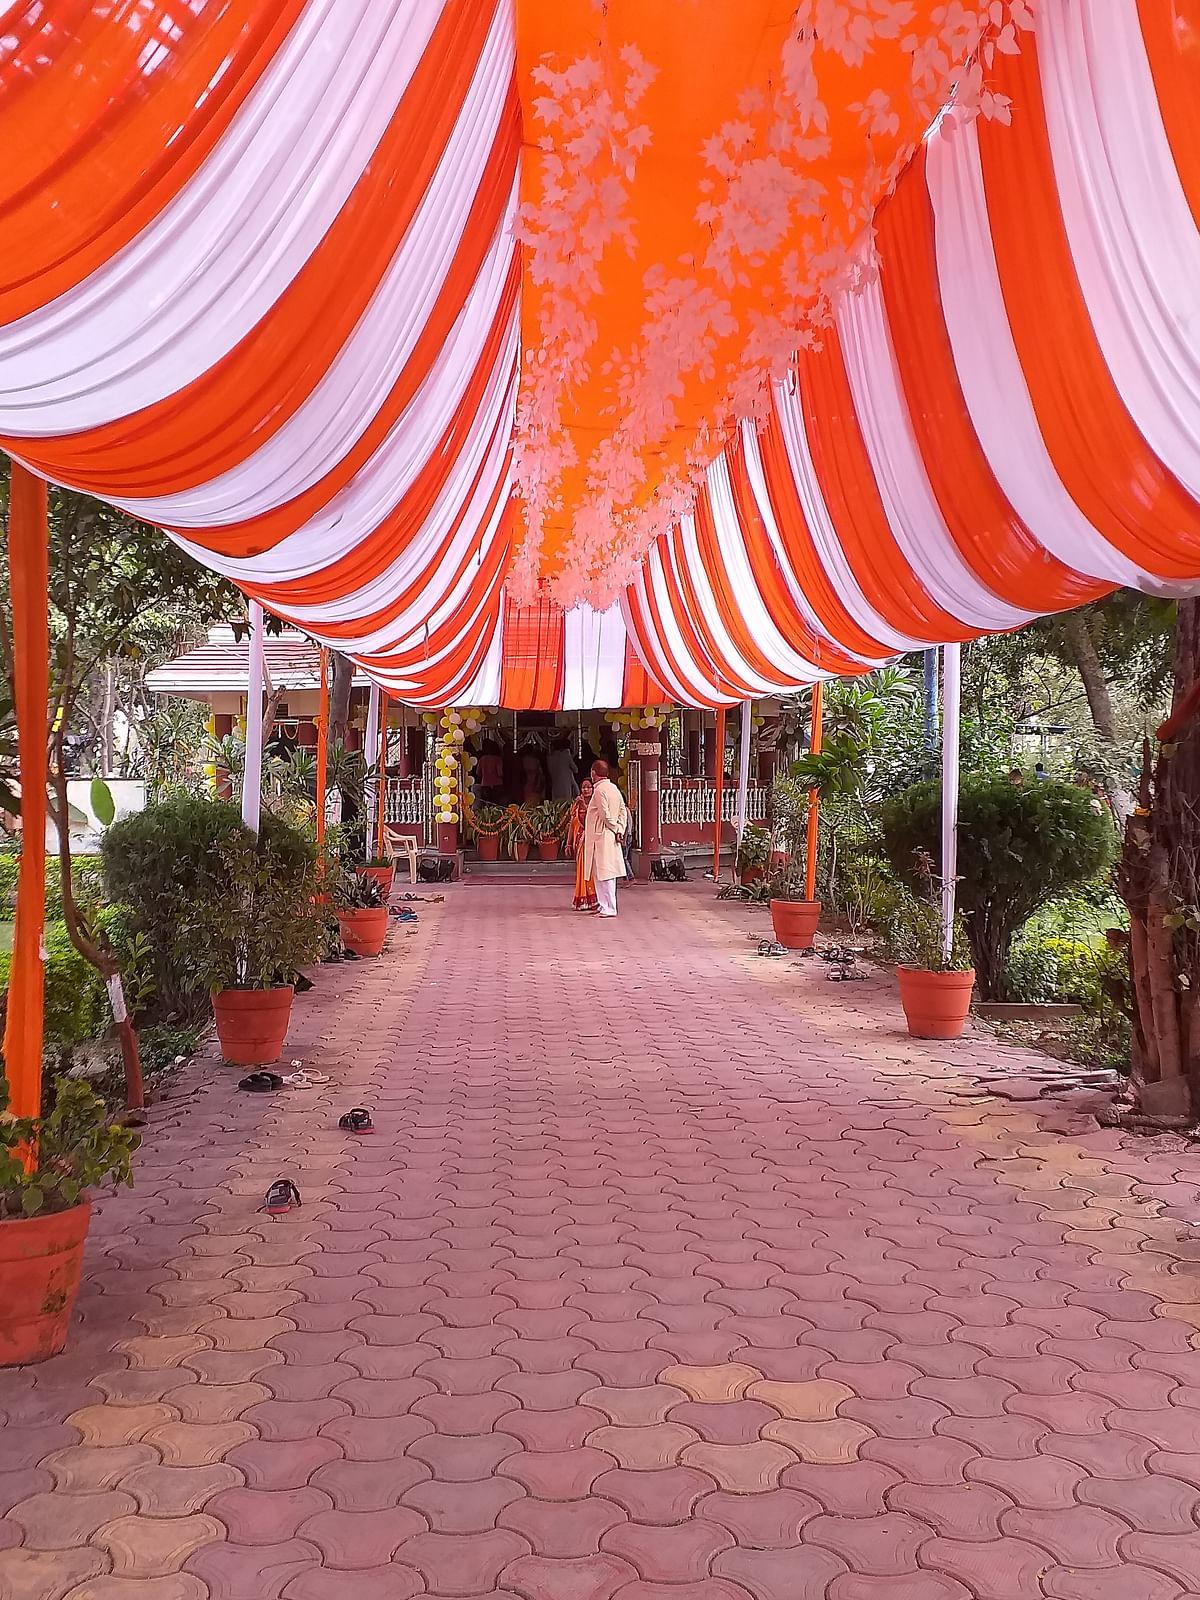 Indore: Spring brings hope on Basant Panchami to say goodbye to Corona